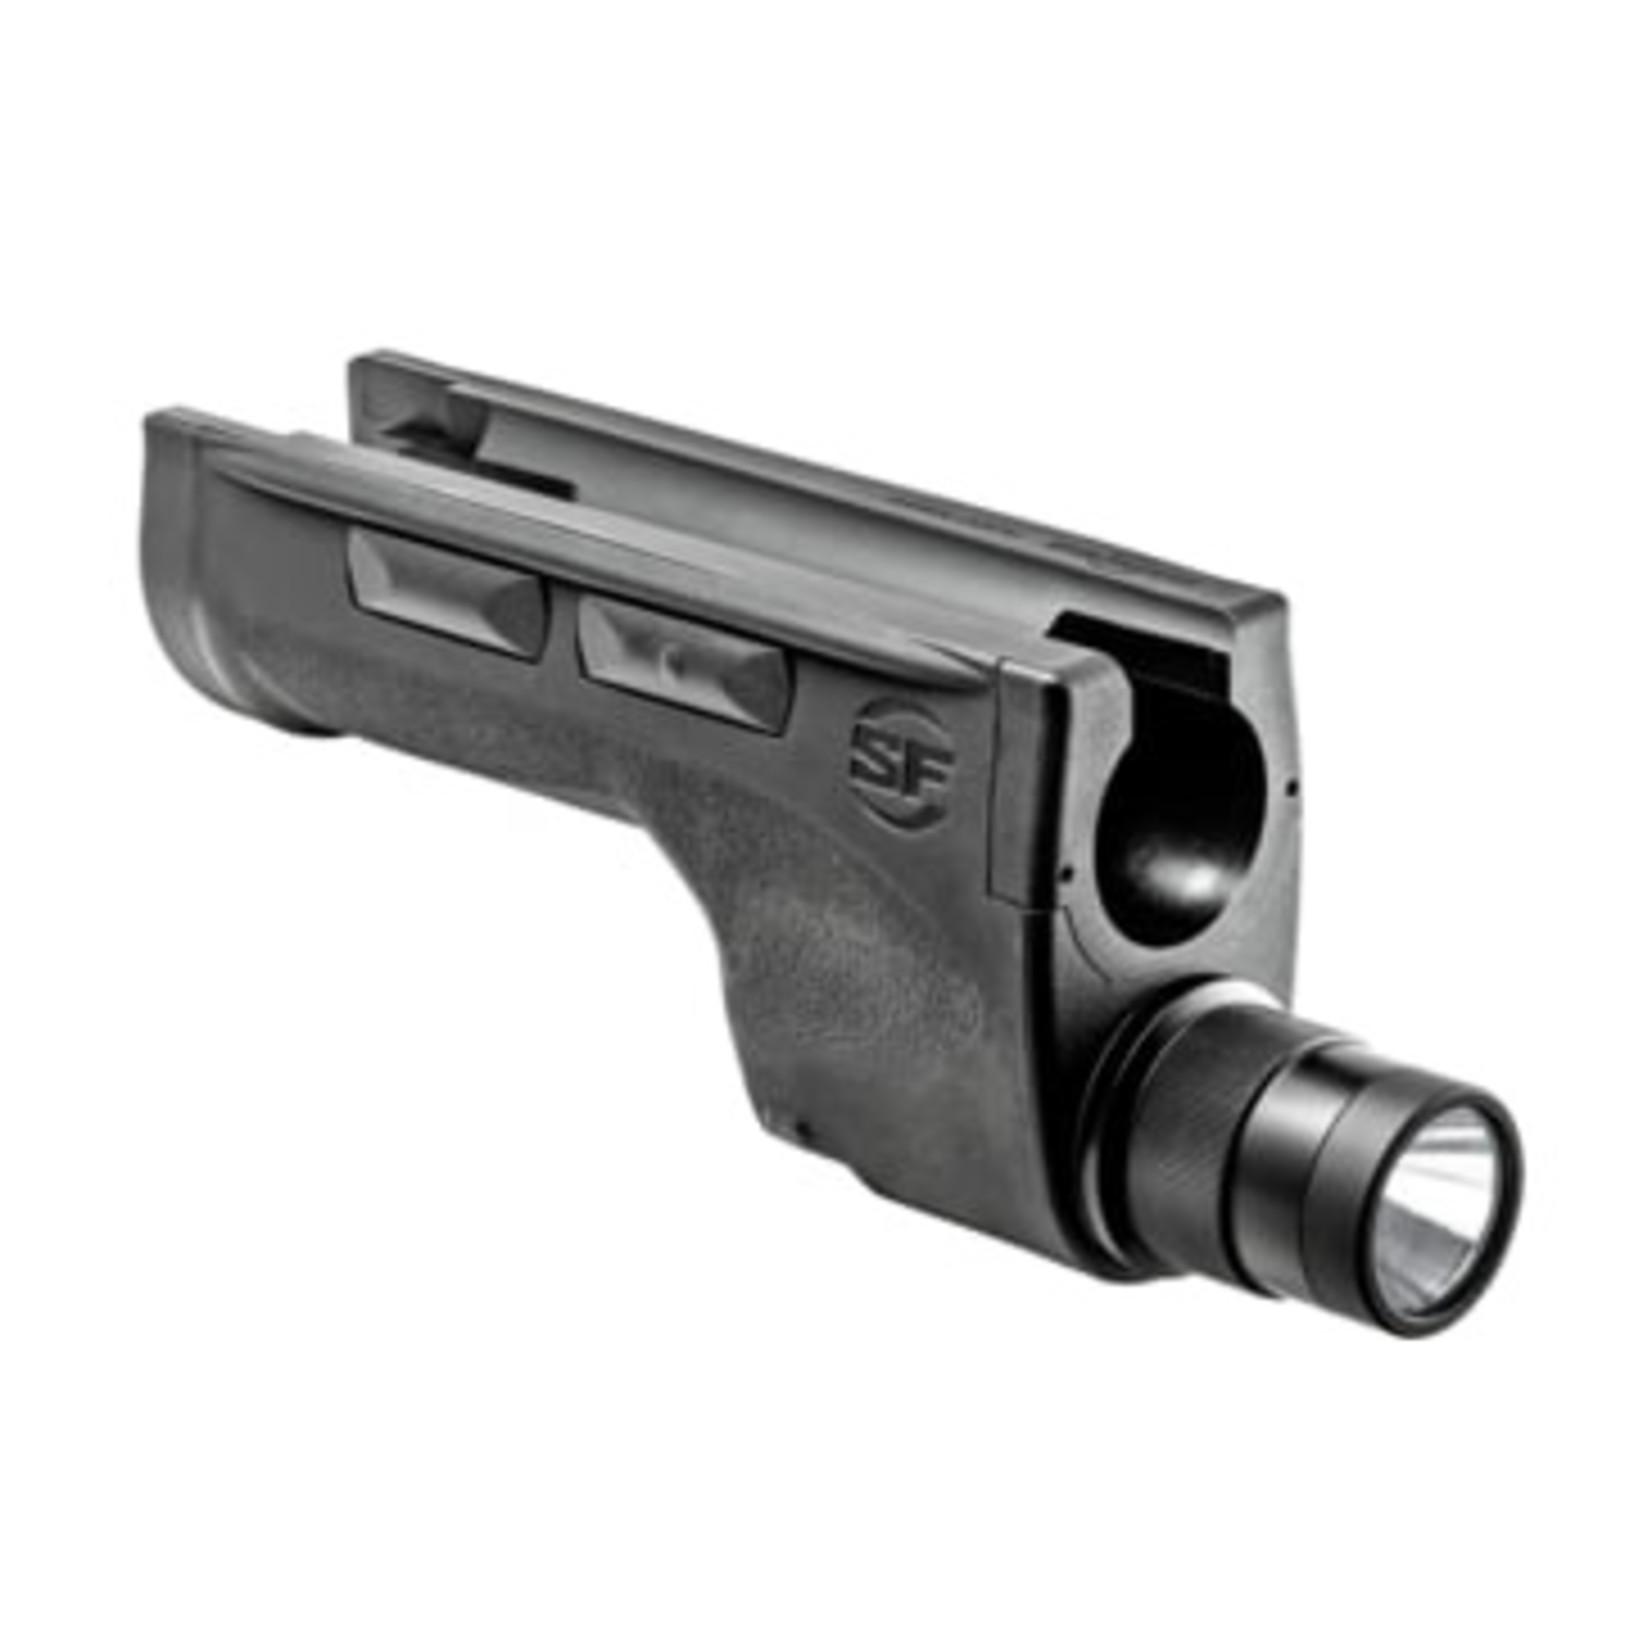 DEDIC 6V SHOTGUN FOREND MOSS 500/590